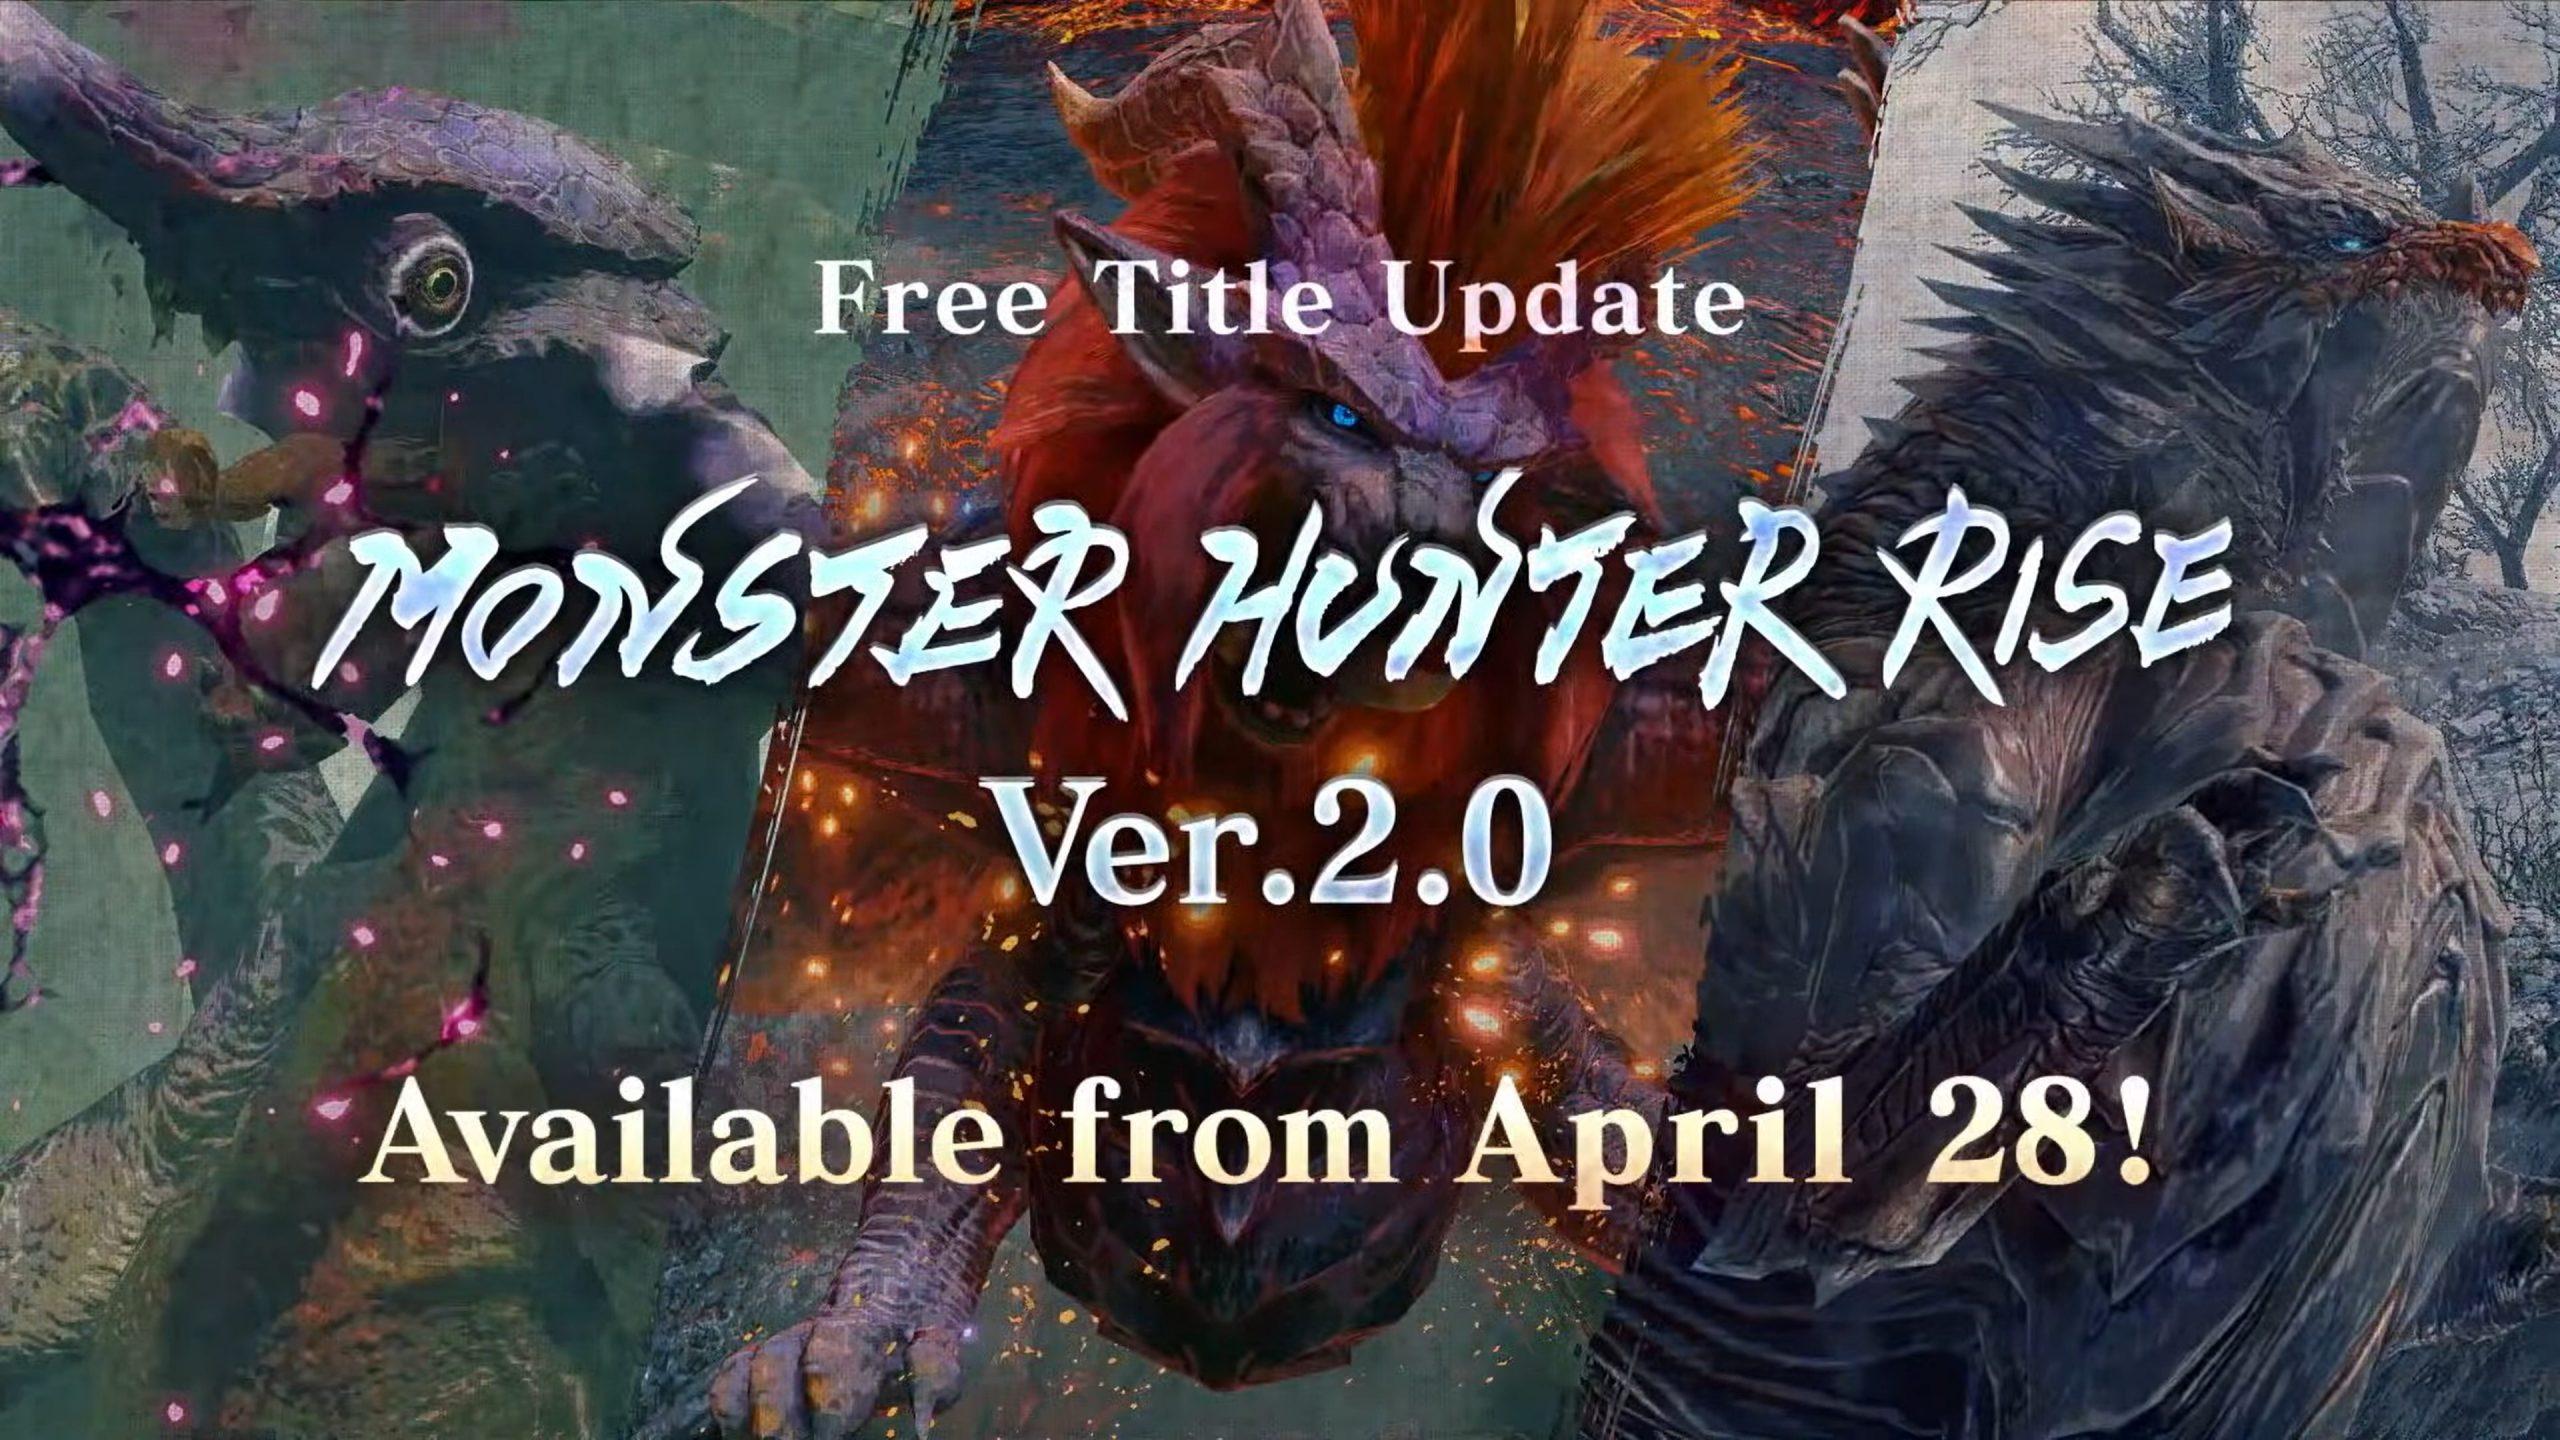 Monster Hunter Rise อัปเดตตัวเกมเวอร์ชัน 2.0 เตรียมเพิ่มมอนสเตอร์ใหม่ๆ ระบบปรับแต่งชุดเกราะ และอื่น ๆ อีกมากมายในวันนี้!